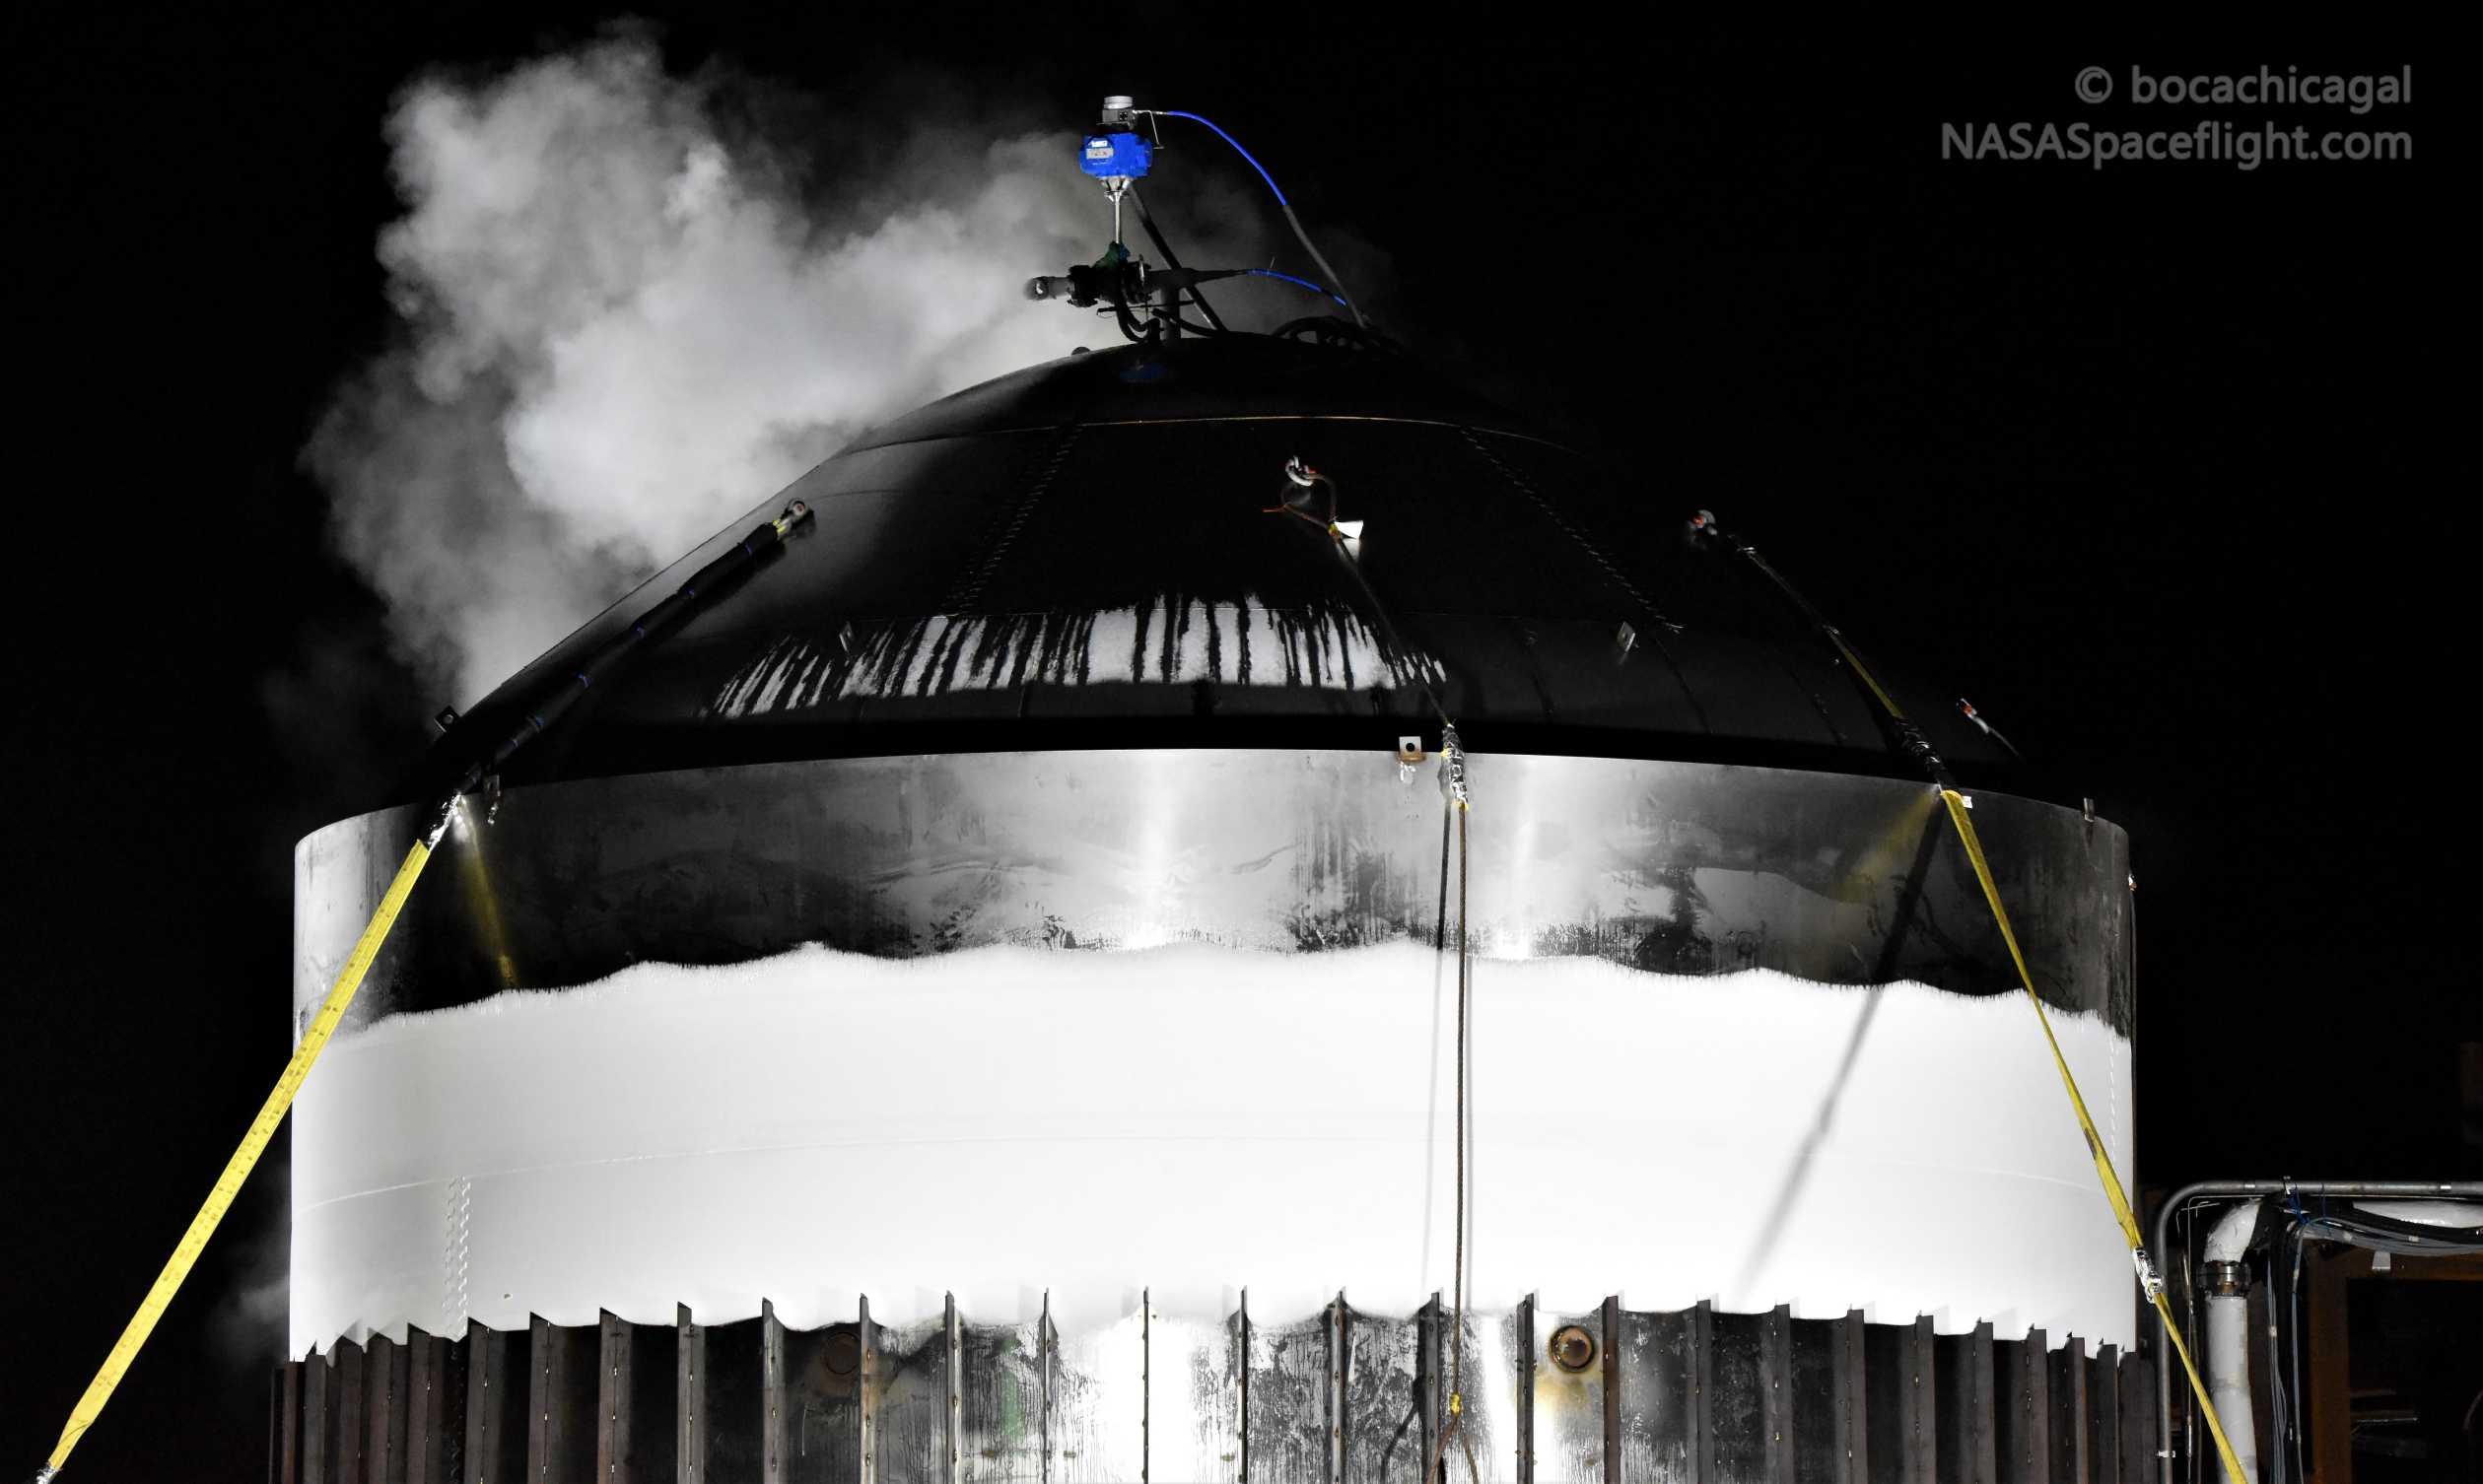 Starship Boca Chica 012820 (NASASpaceflight – bocachicagal) frosty test tank #2 4 (c)